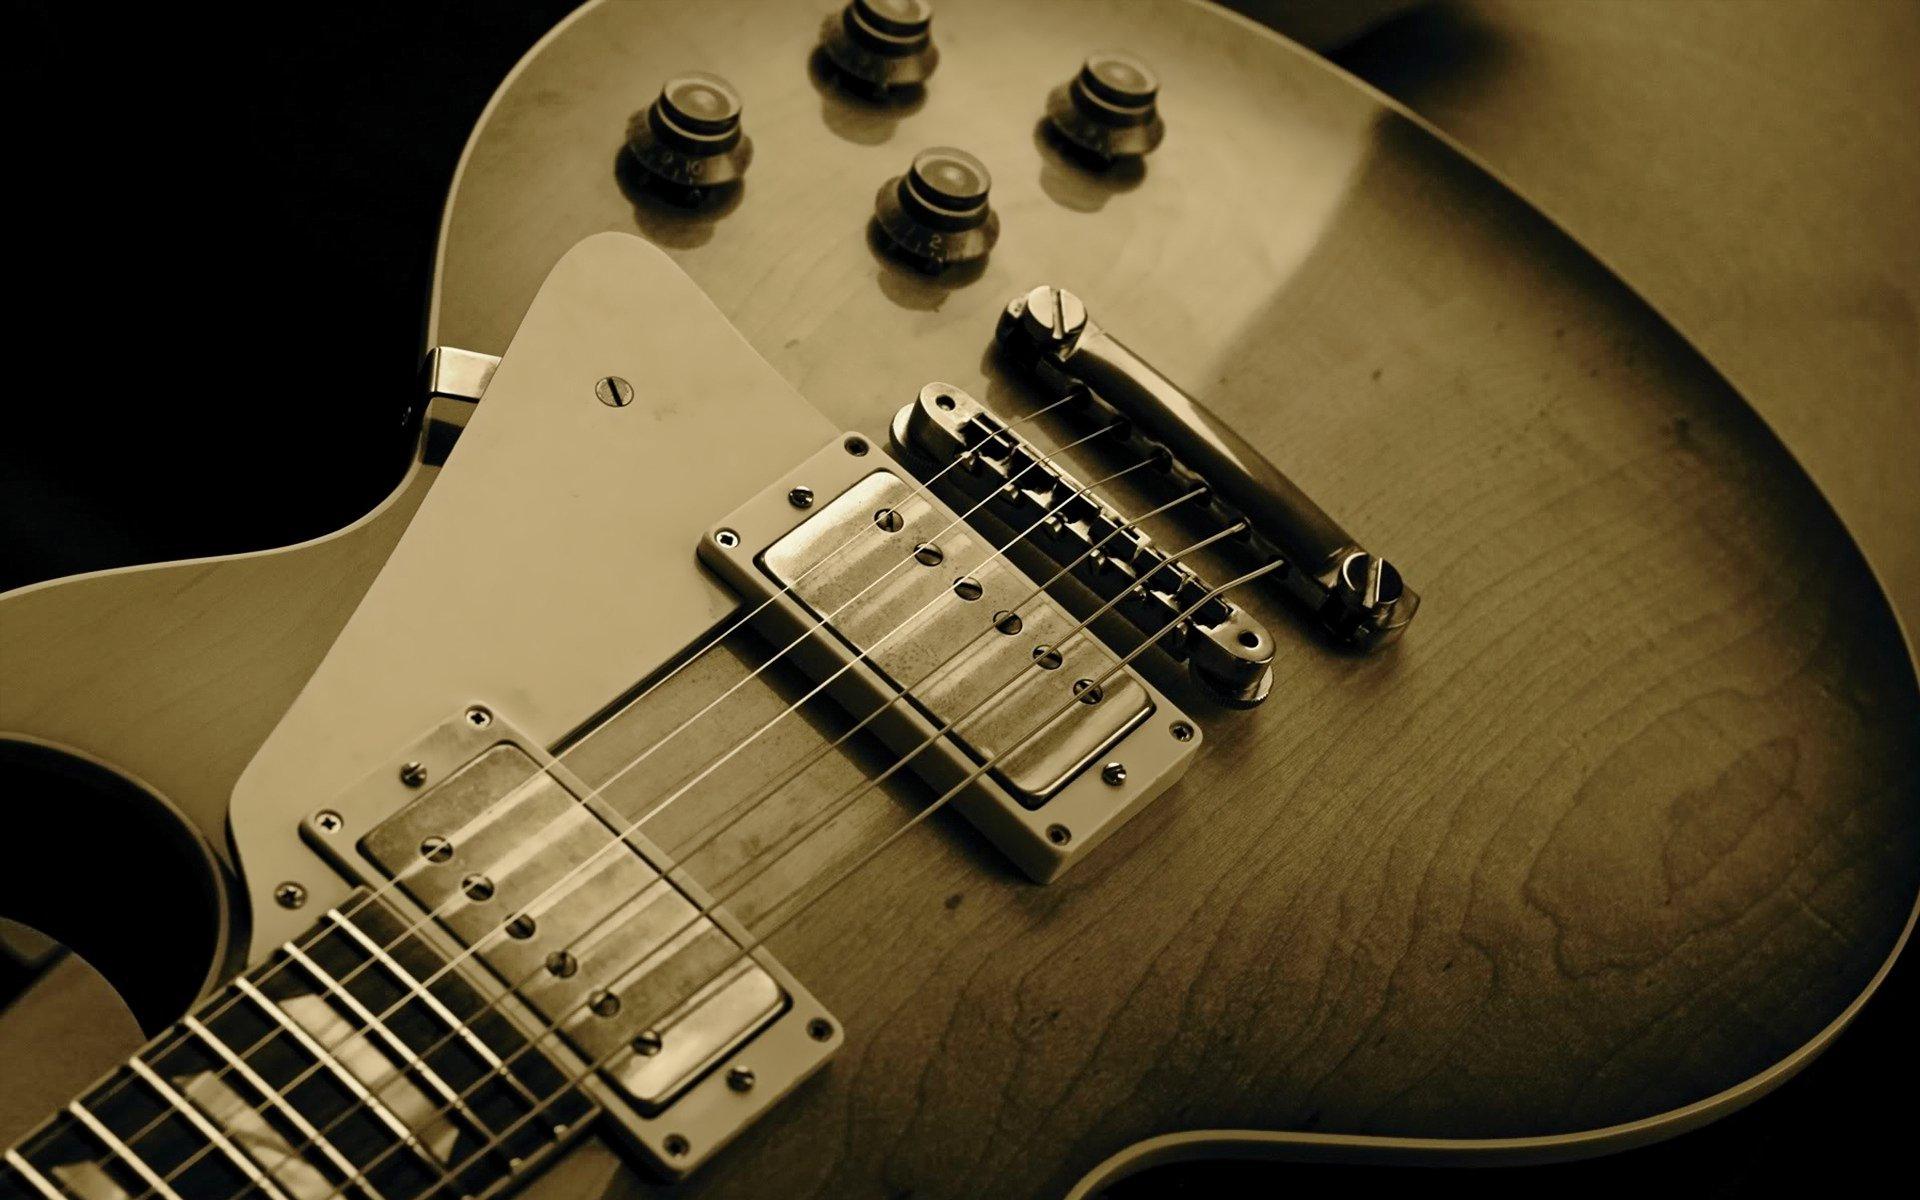 electric-guitar-wallpaper-8288-8749-hd-wallpapers